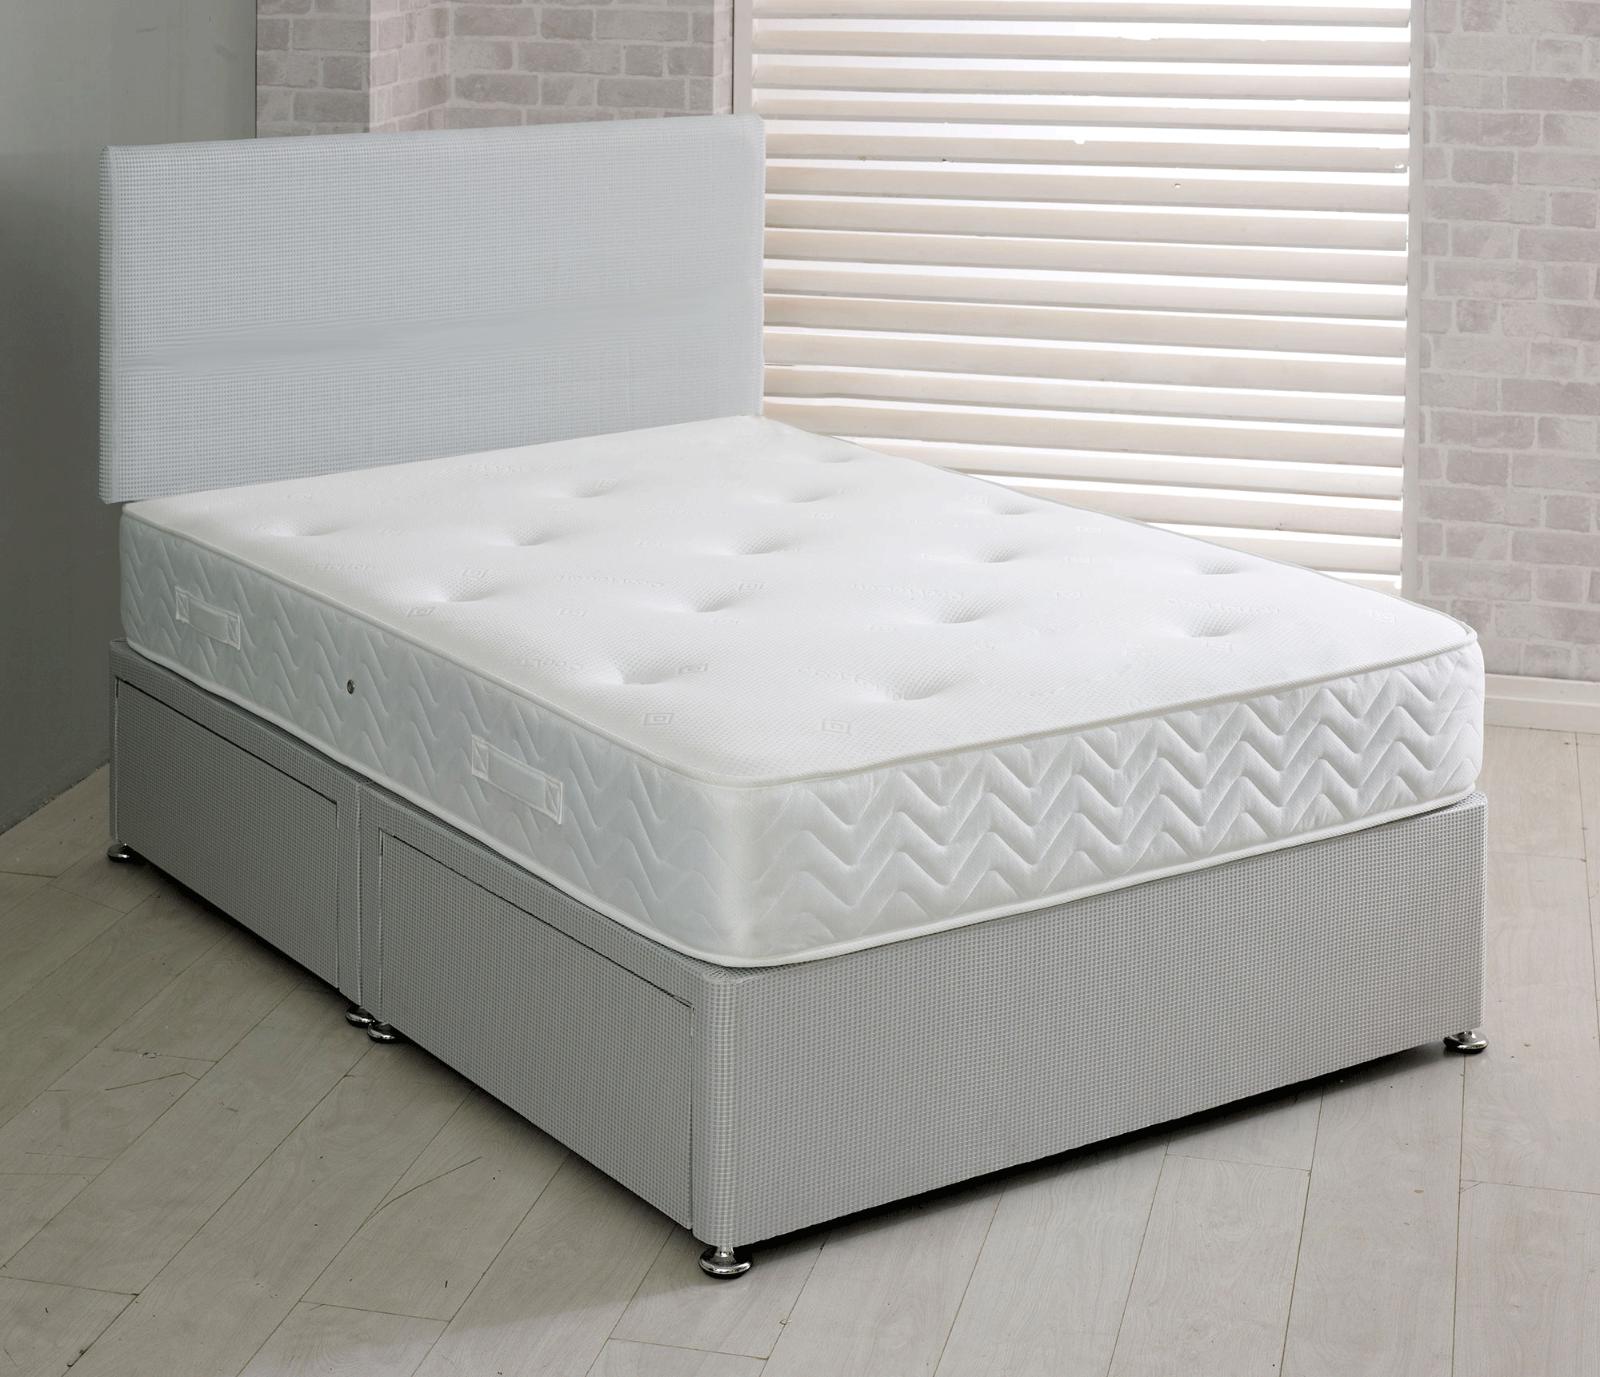 Grey Memory Foam Fabric Divan Bed With Mattress & Headboard 3FT 4FT6 Double 5FT 2